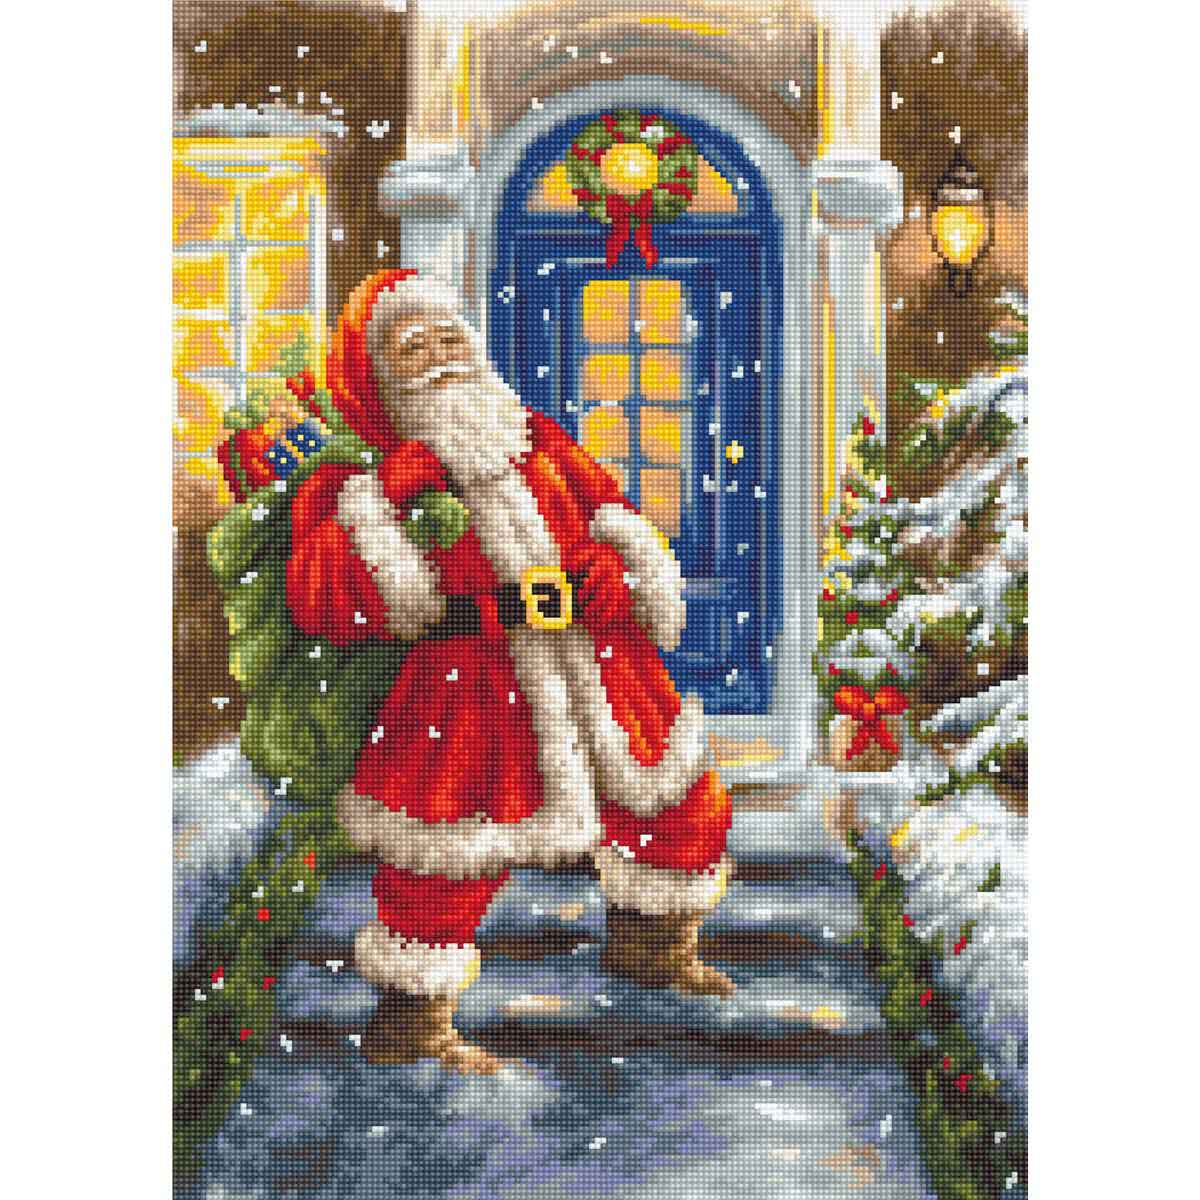 B563 Набор для вышивания 'Дед Мороз' 24*33,5 см, Luca-S